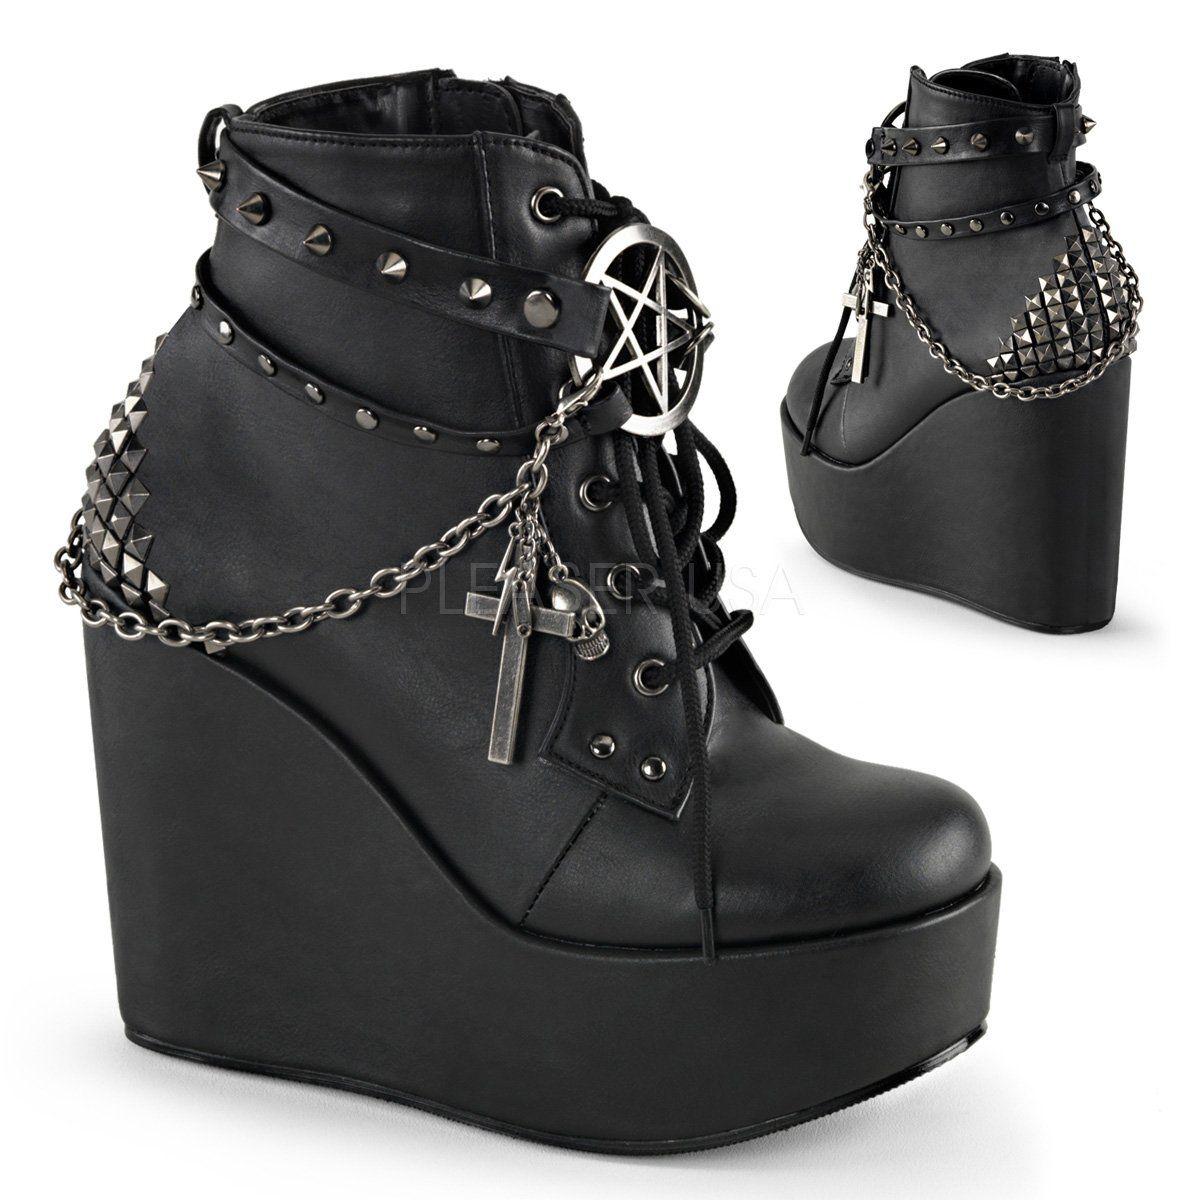 Demonia POISON 101 Nero Vegan Pelle Donna Ankle Stivali in